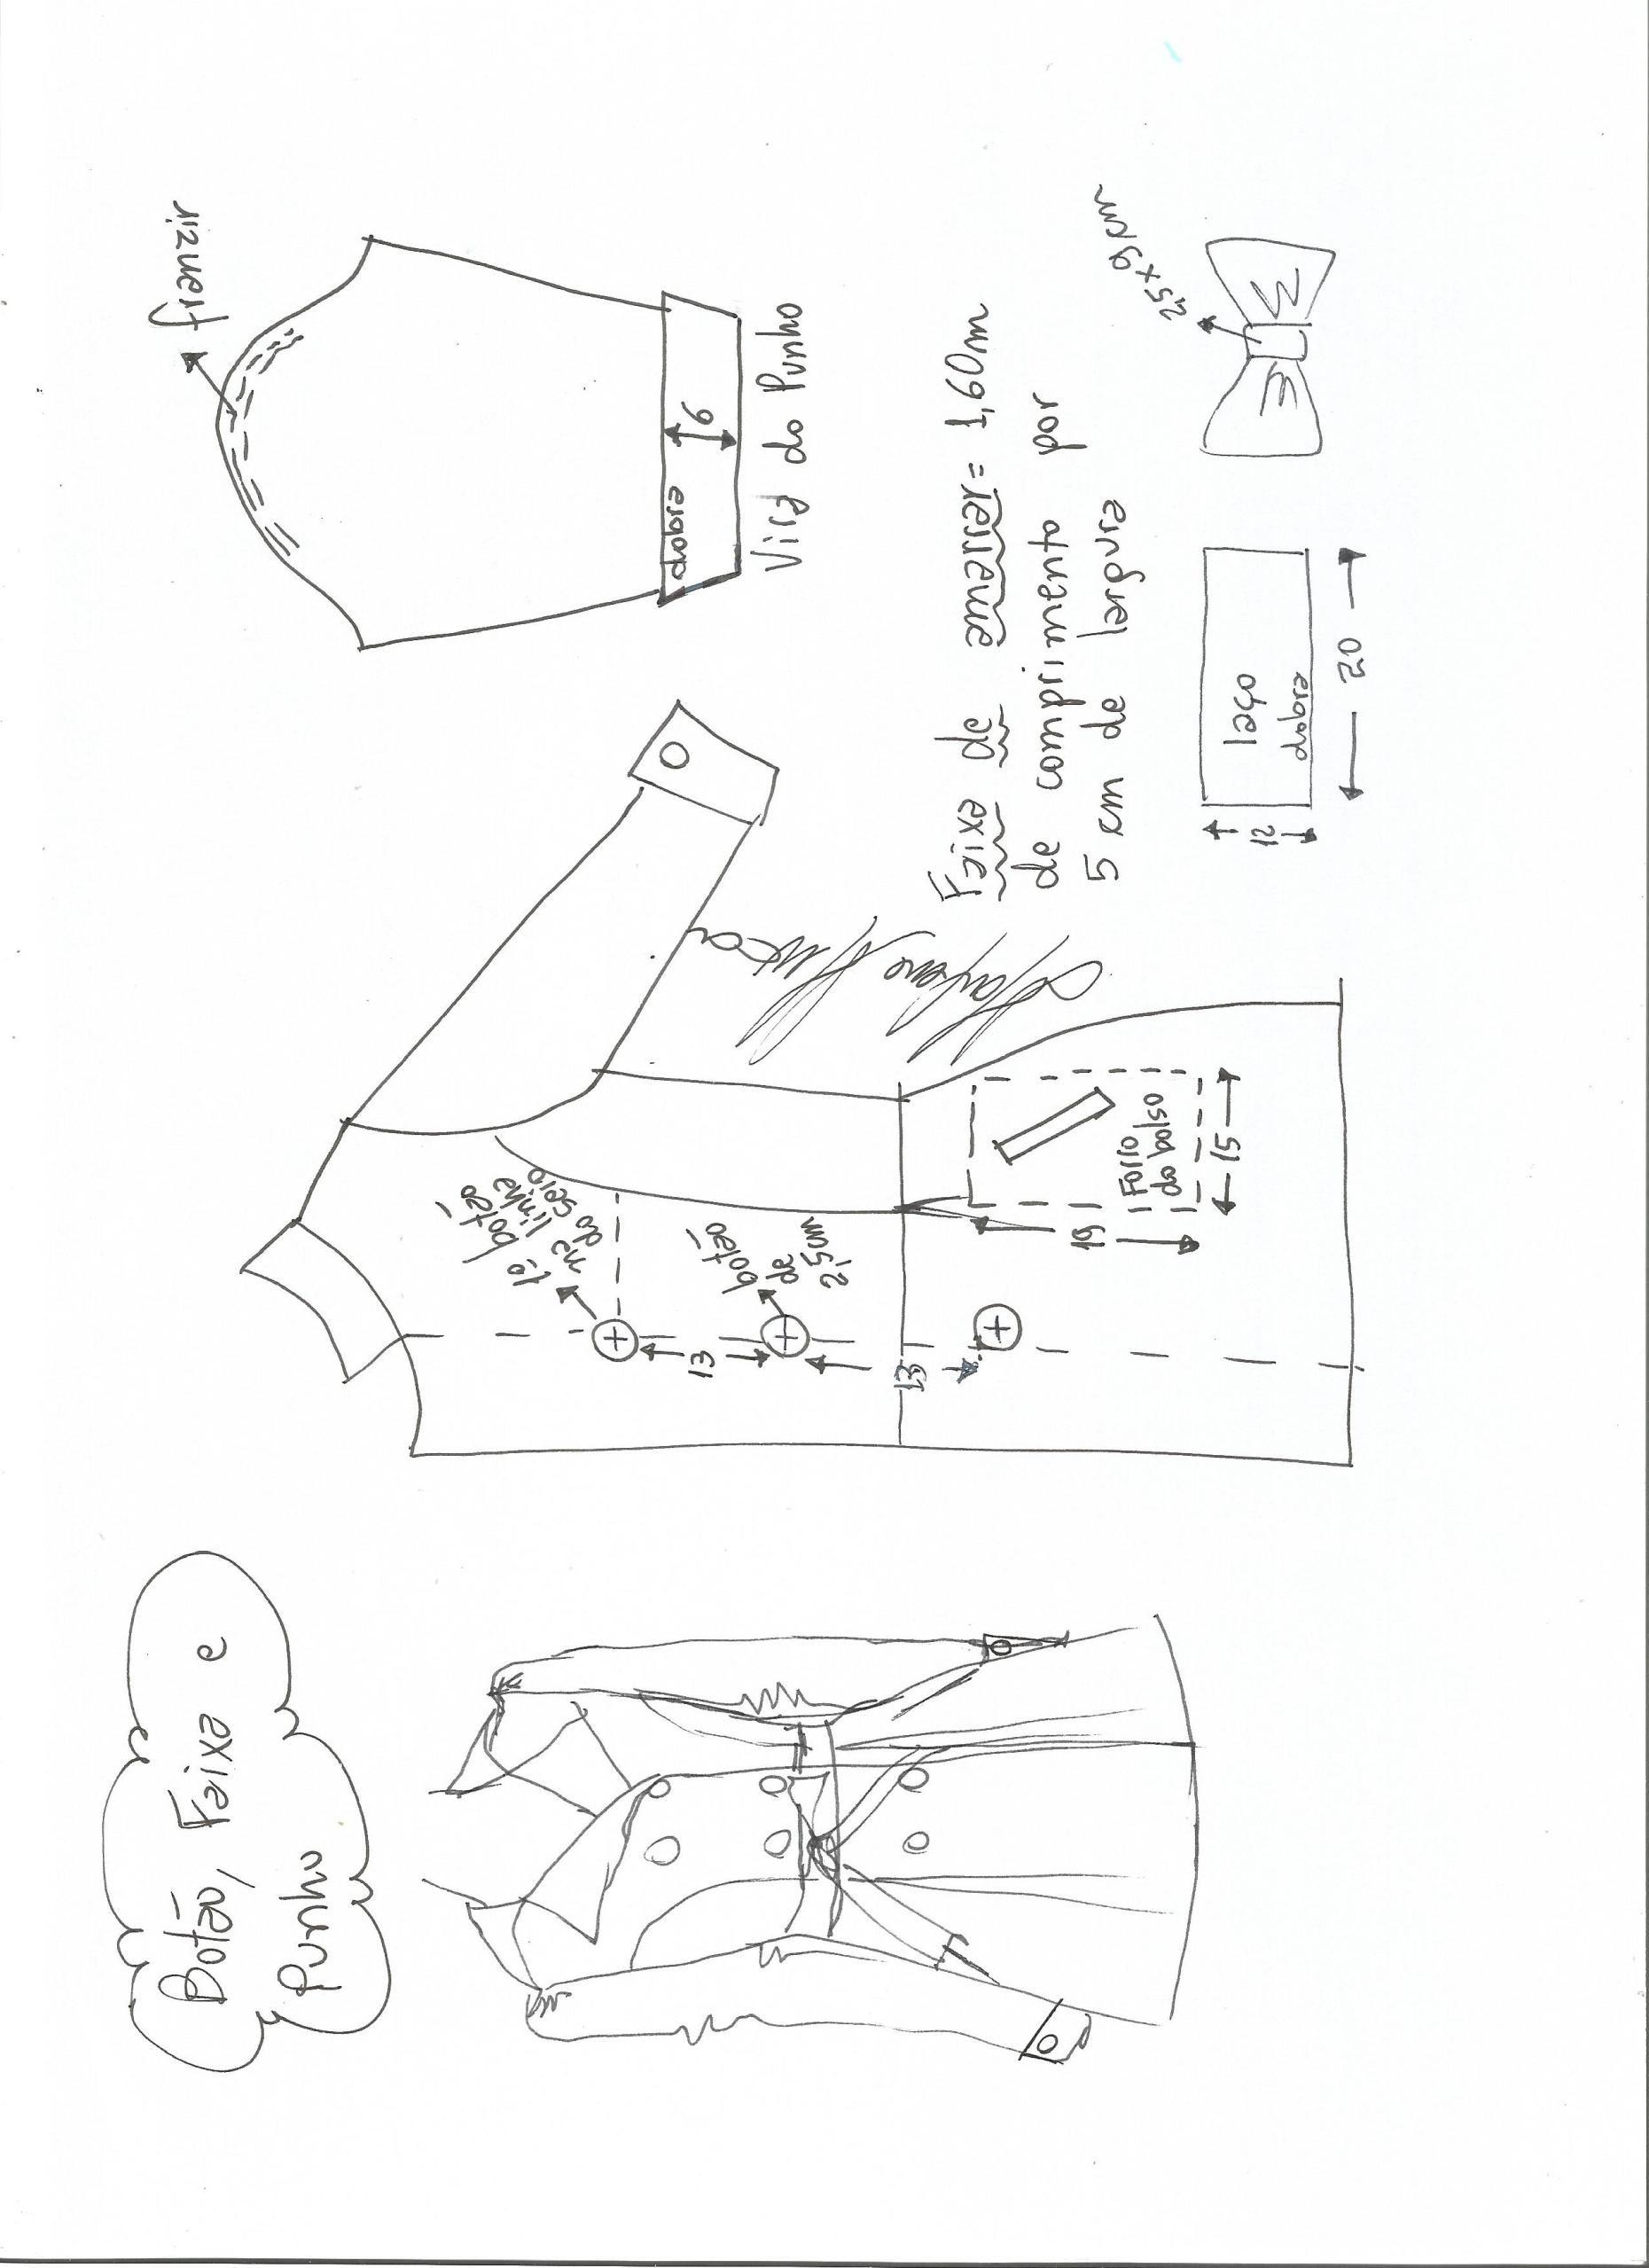 Trench Coat com pregas | modelagens | Pinterest | Costura, Ropa y Moldes